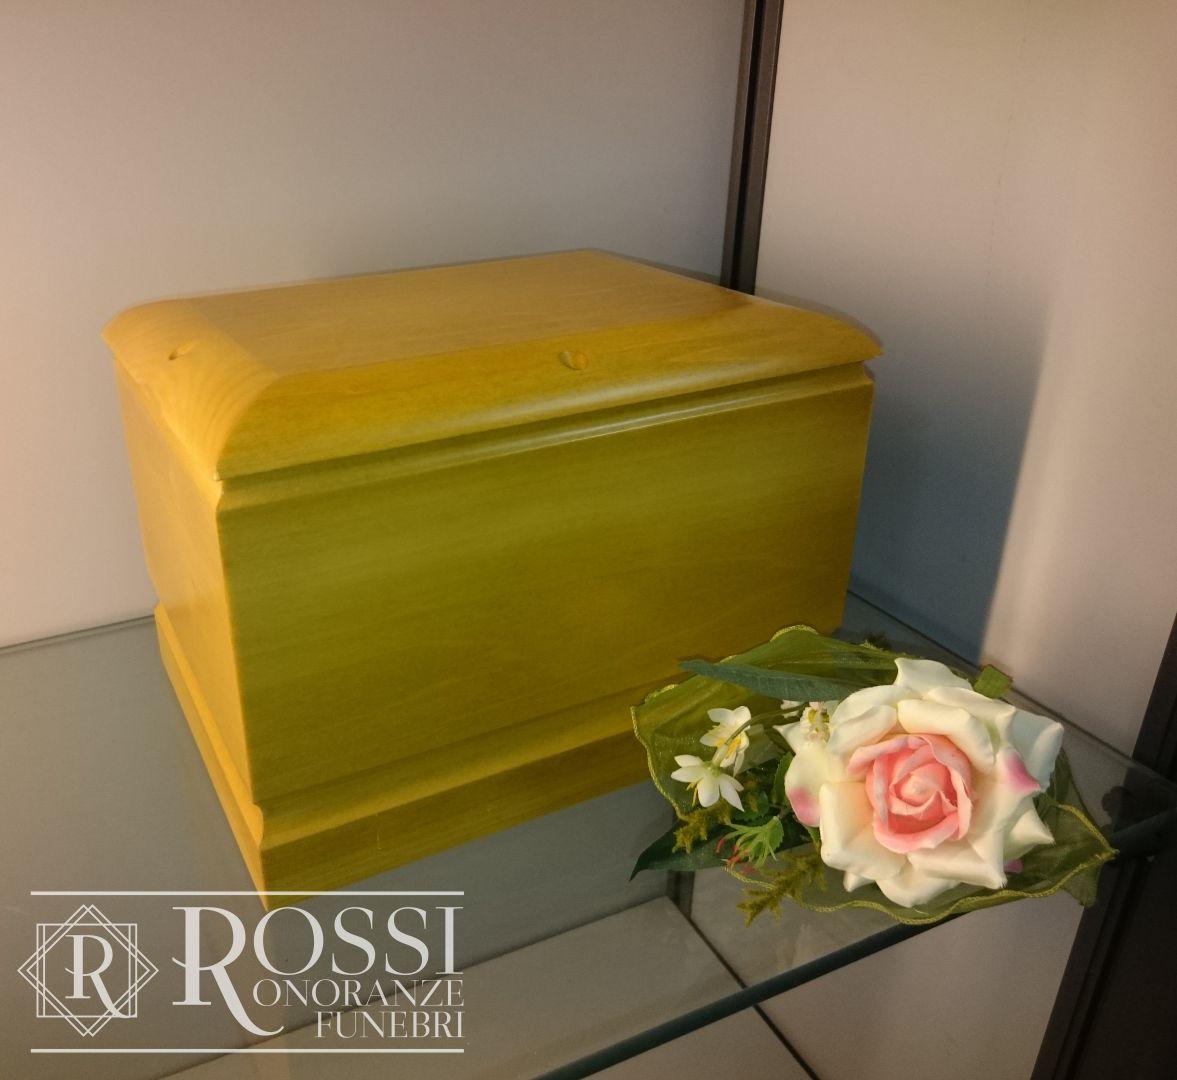 urna-rovere-1507794106118